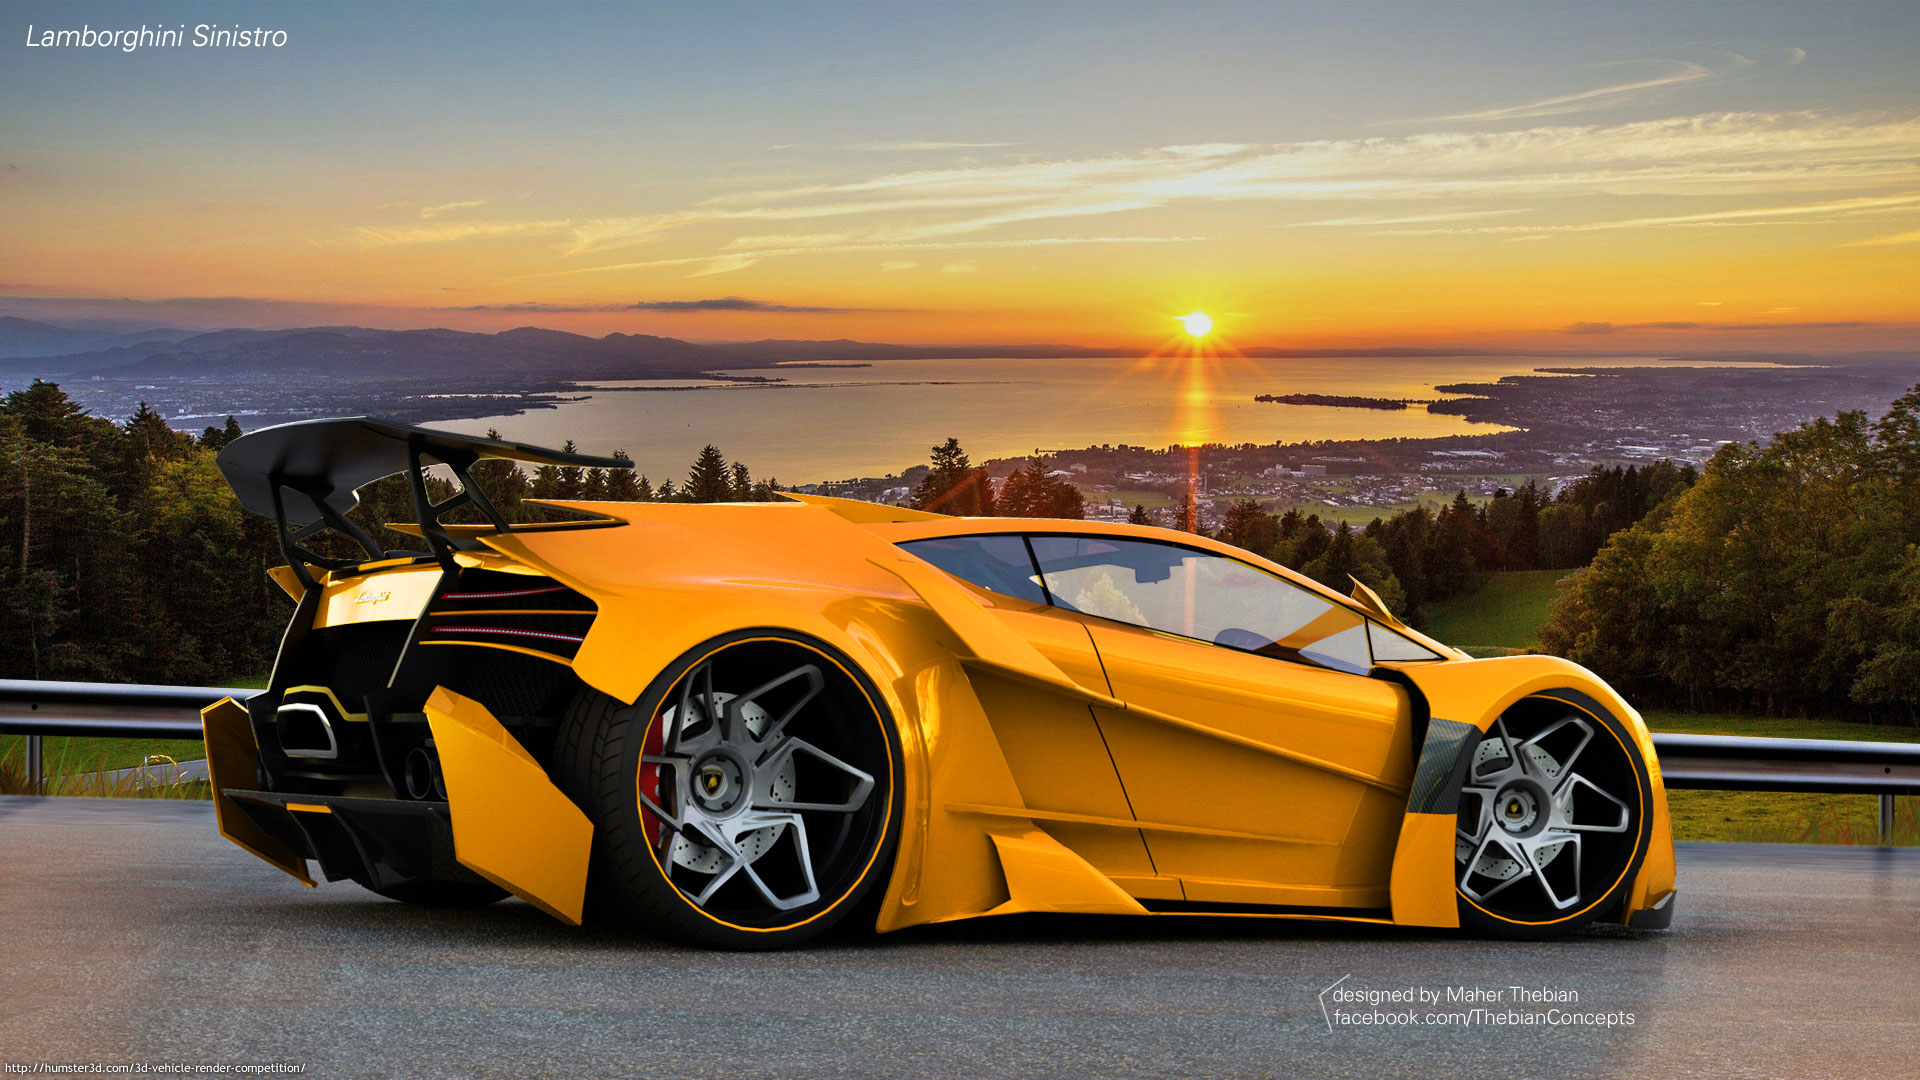 Lamborghini Sinistro 3d art